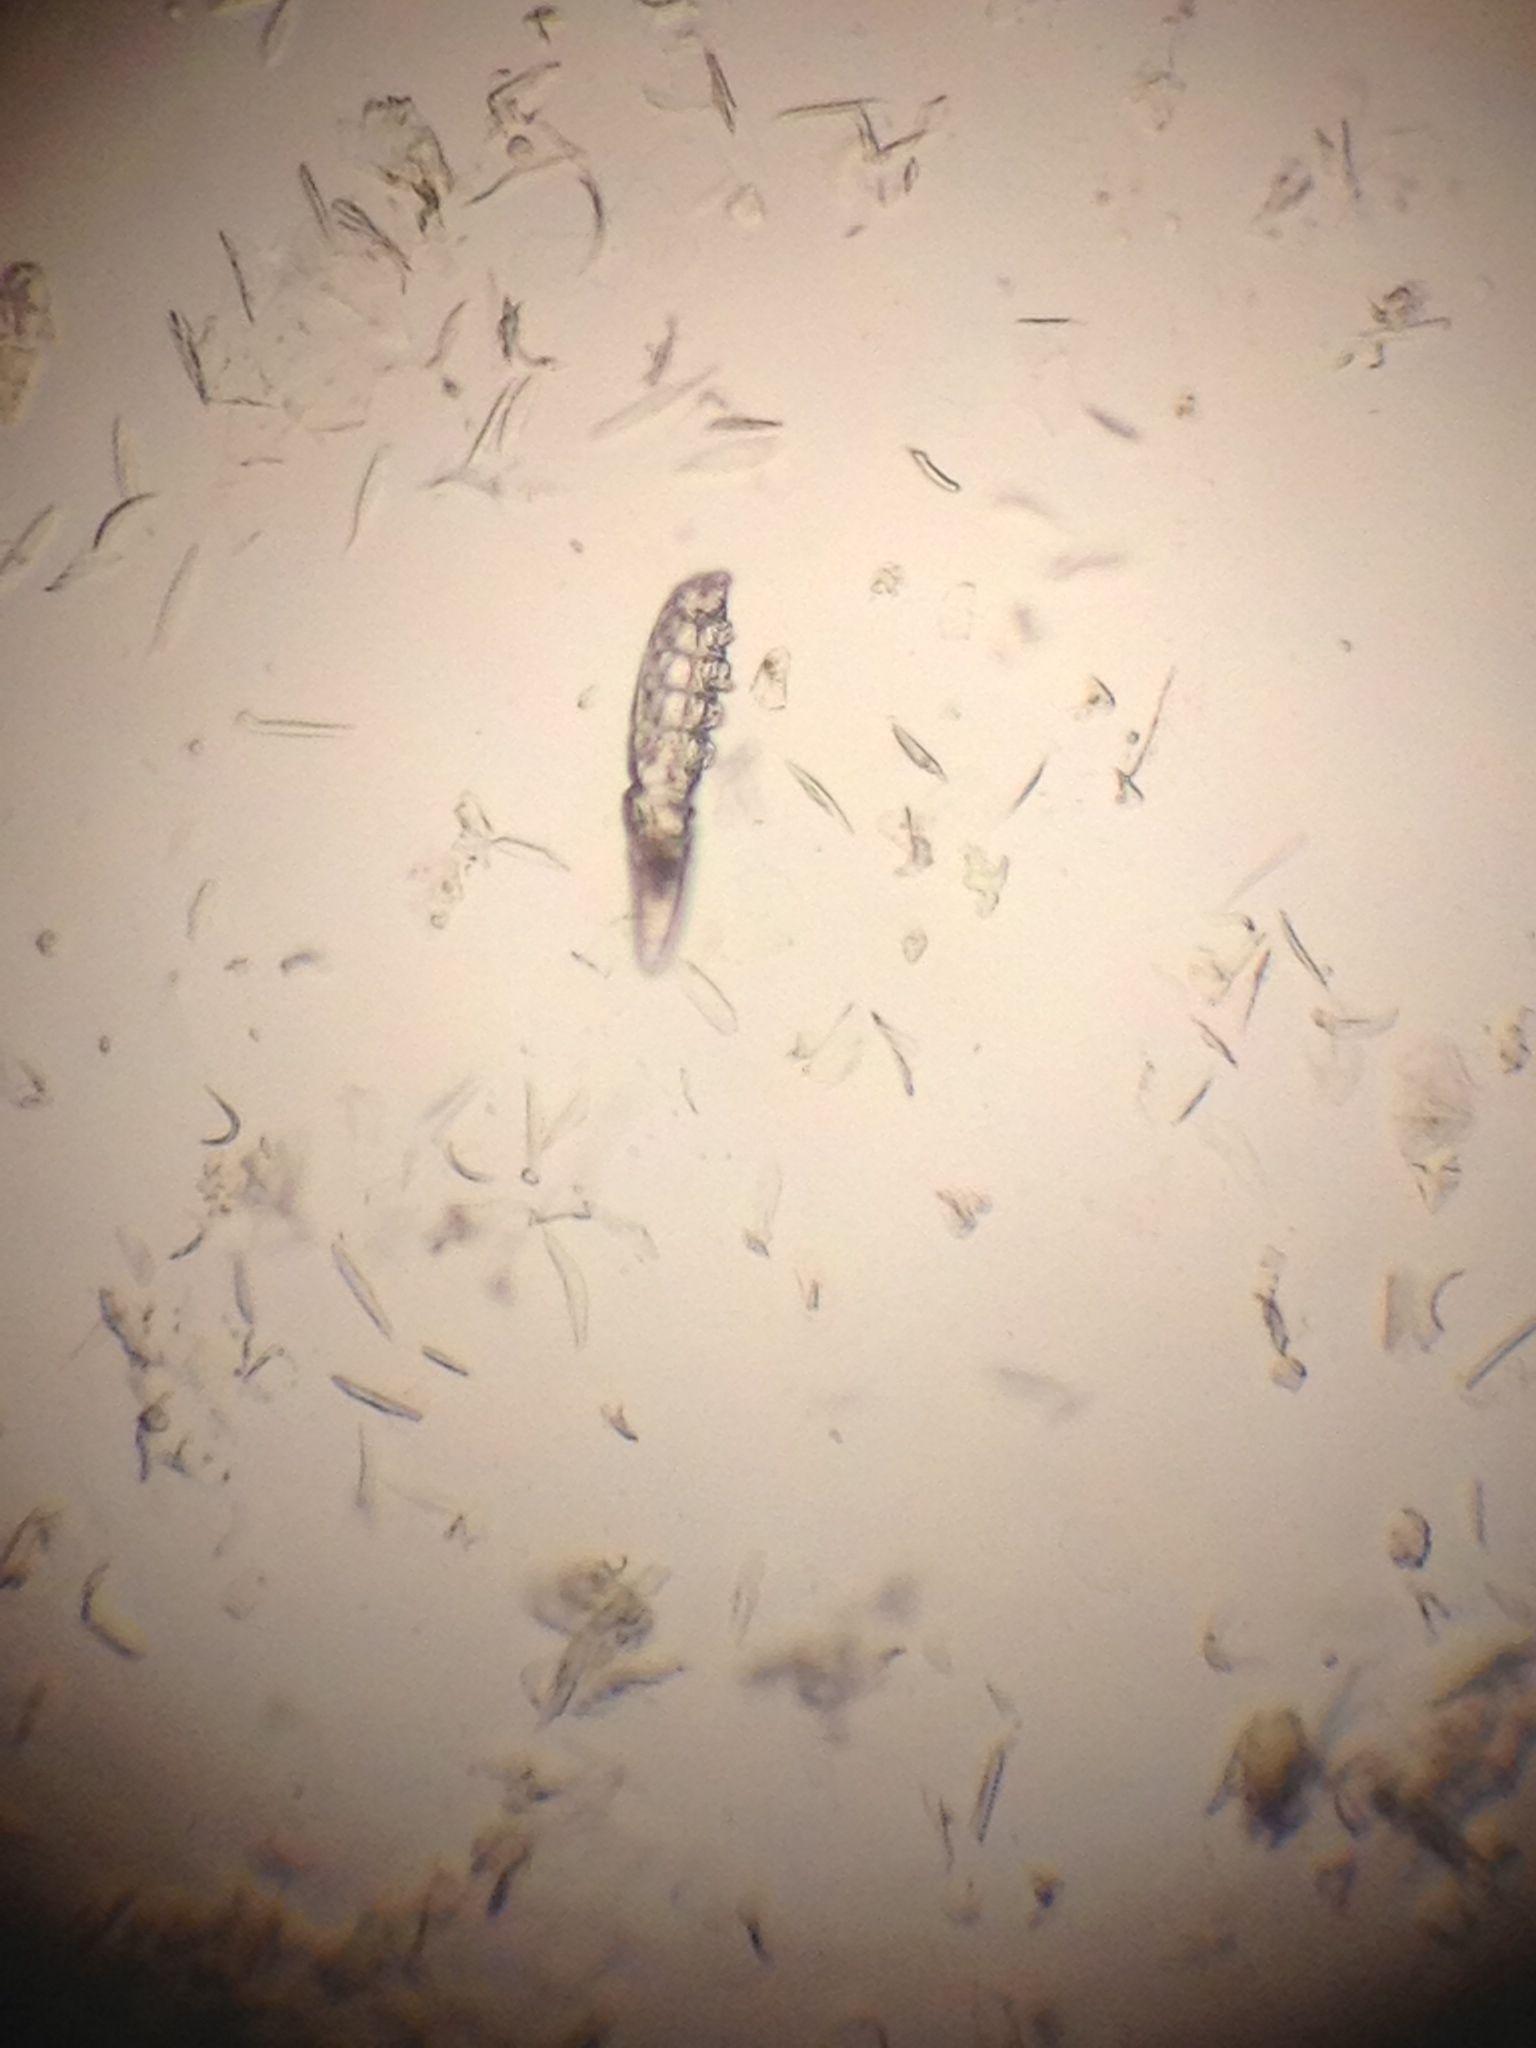 Demodex under the microscope, thanks Dr. Vega for sharing